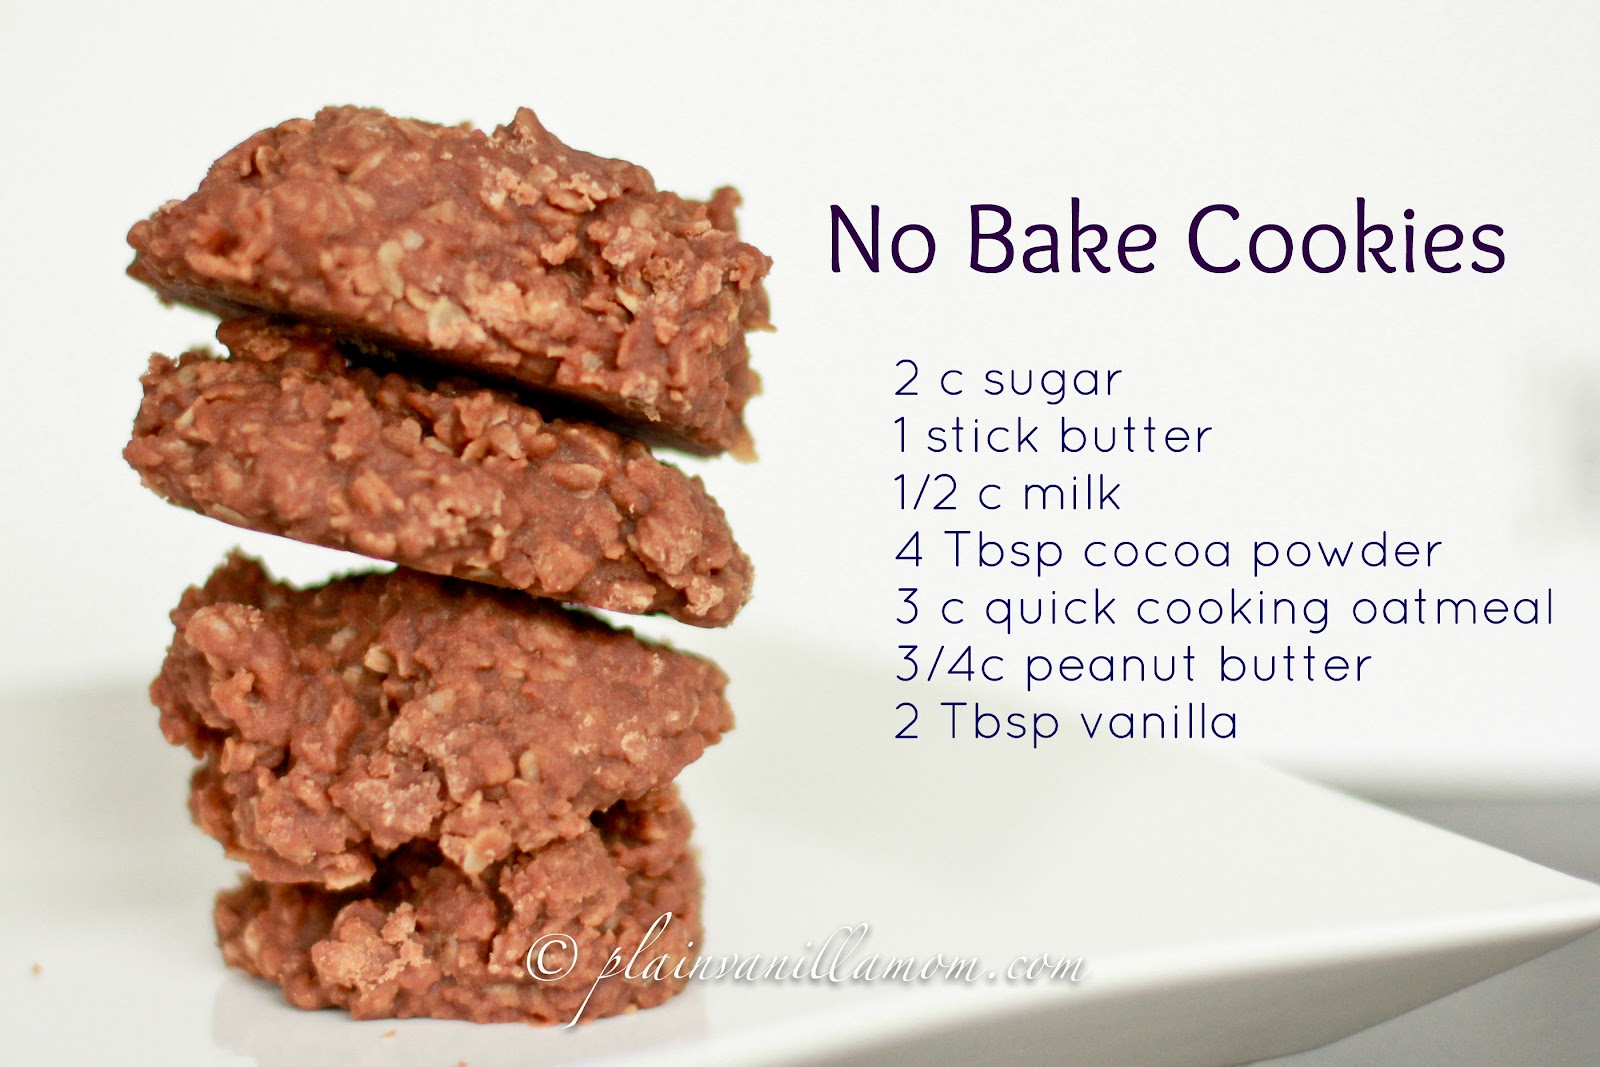 No Bake Cookies Recipe Food Network